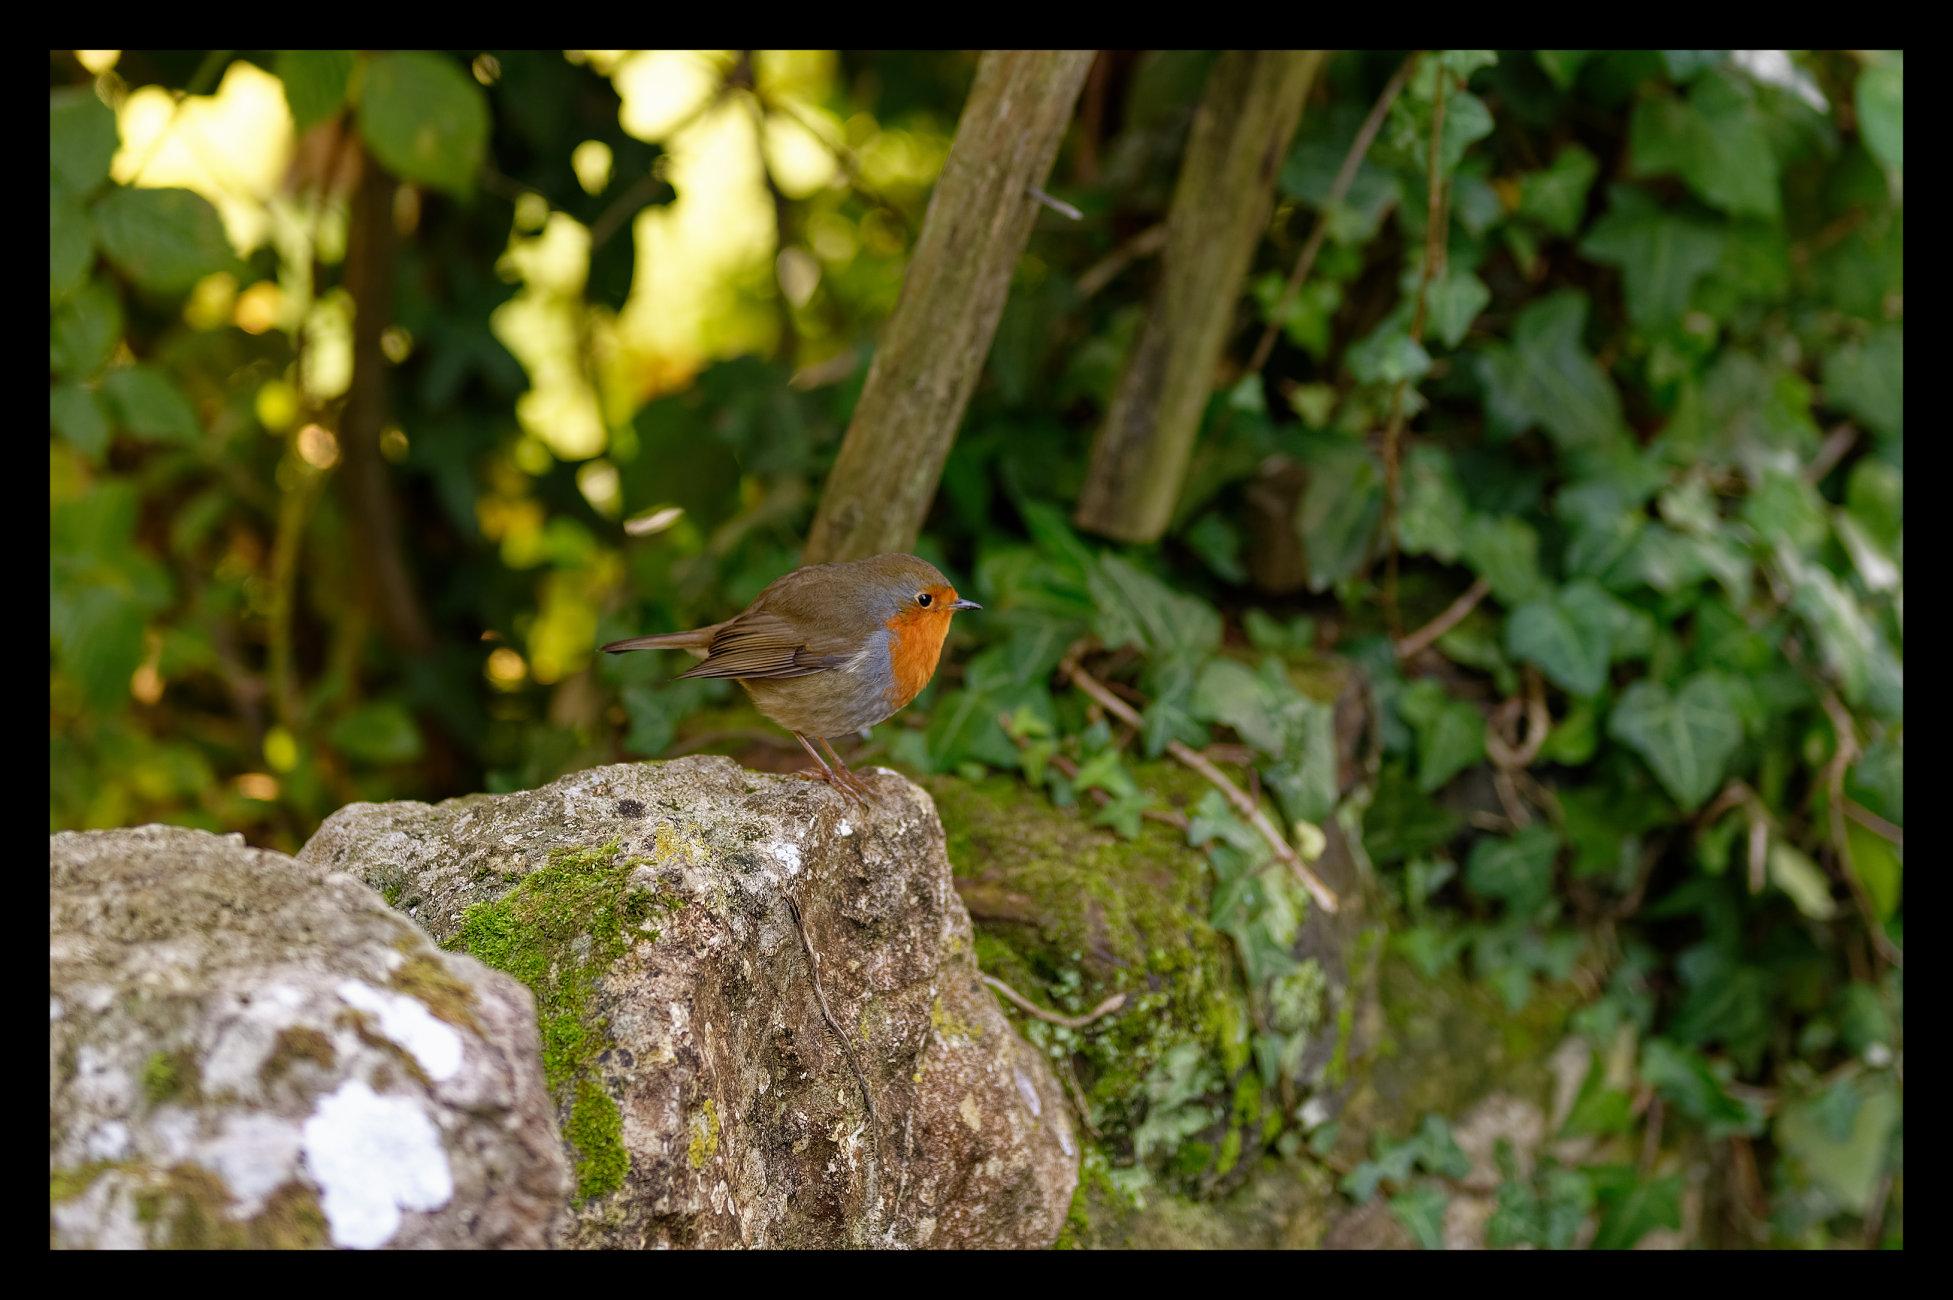 Robin on a wall.